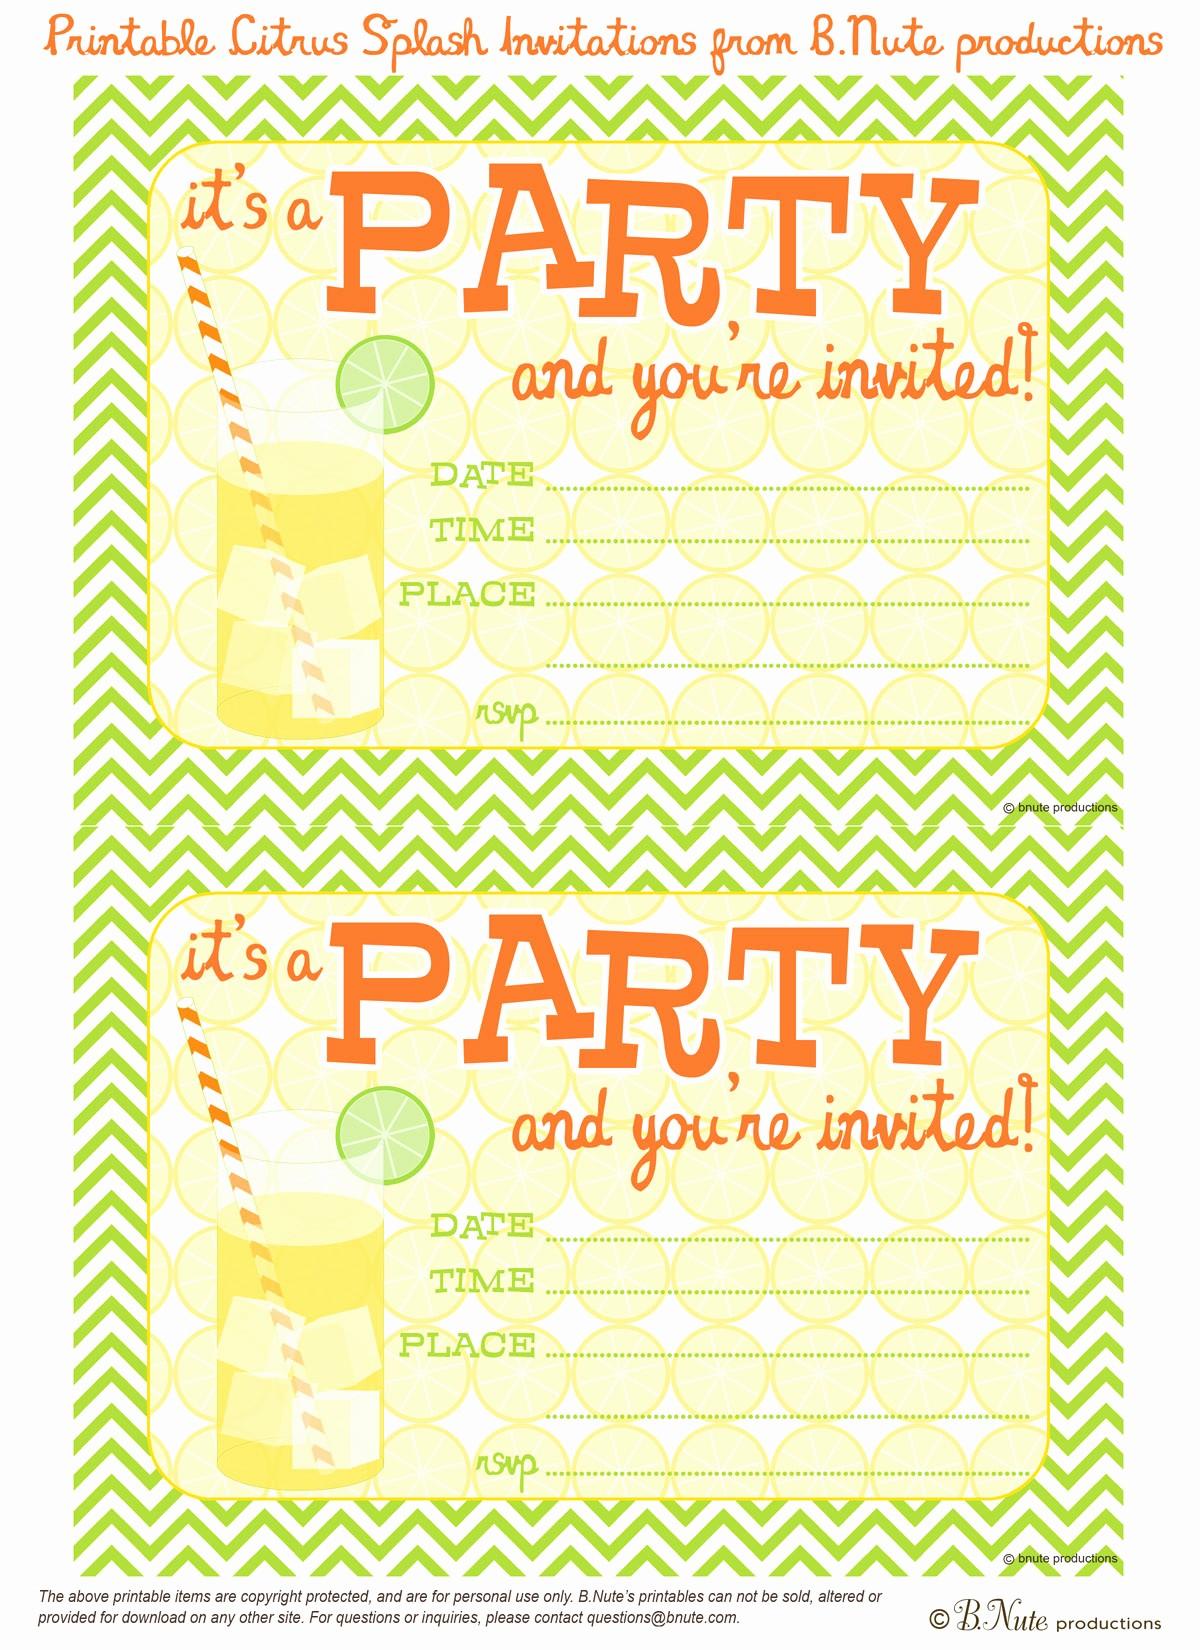 Free Templates for Birthday Invitations Luxury Party Invitation Templates Free Printable Party